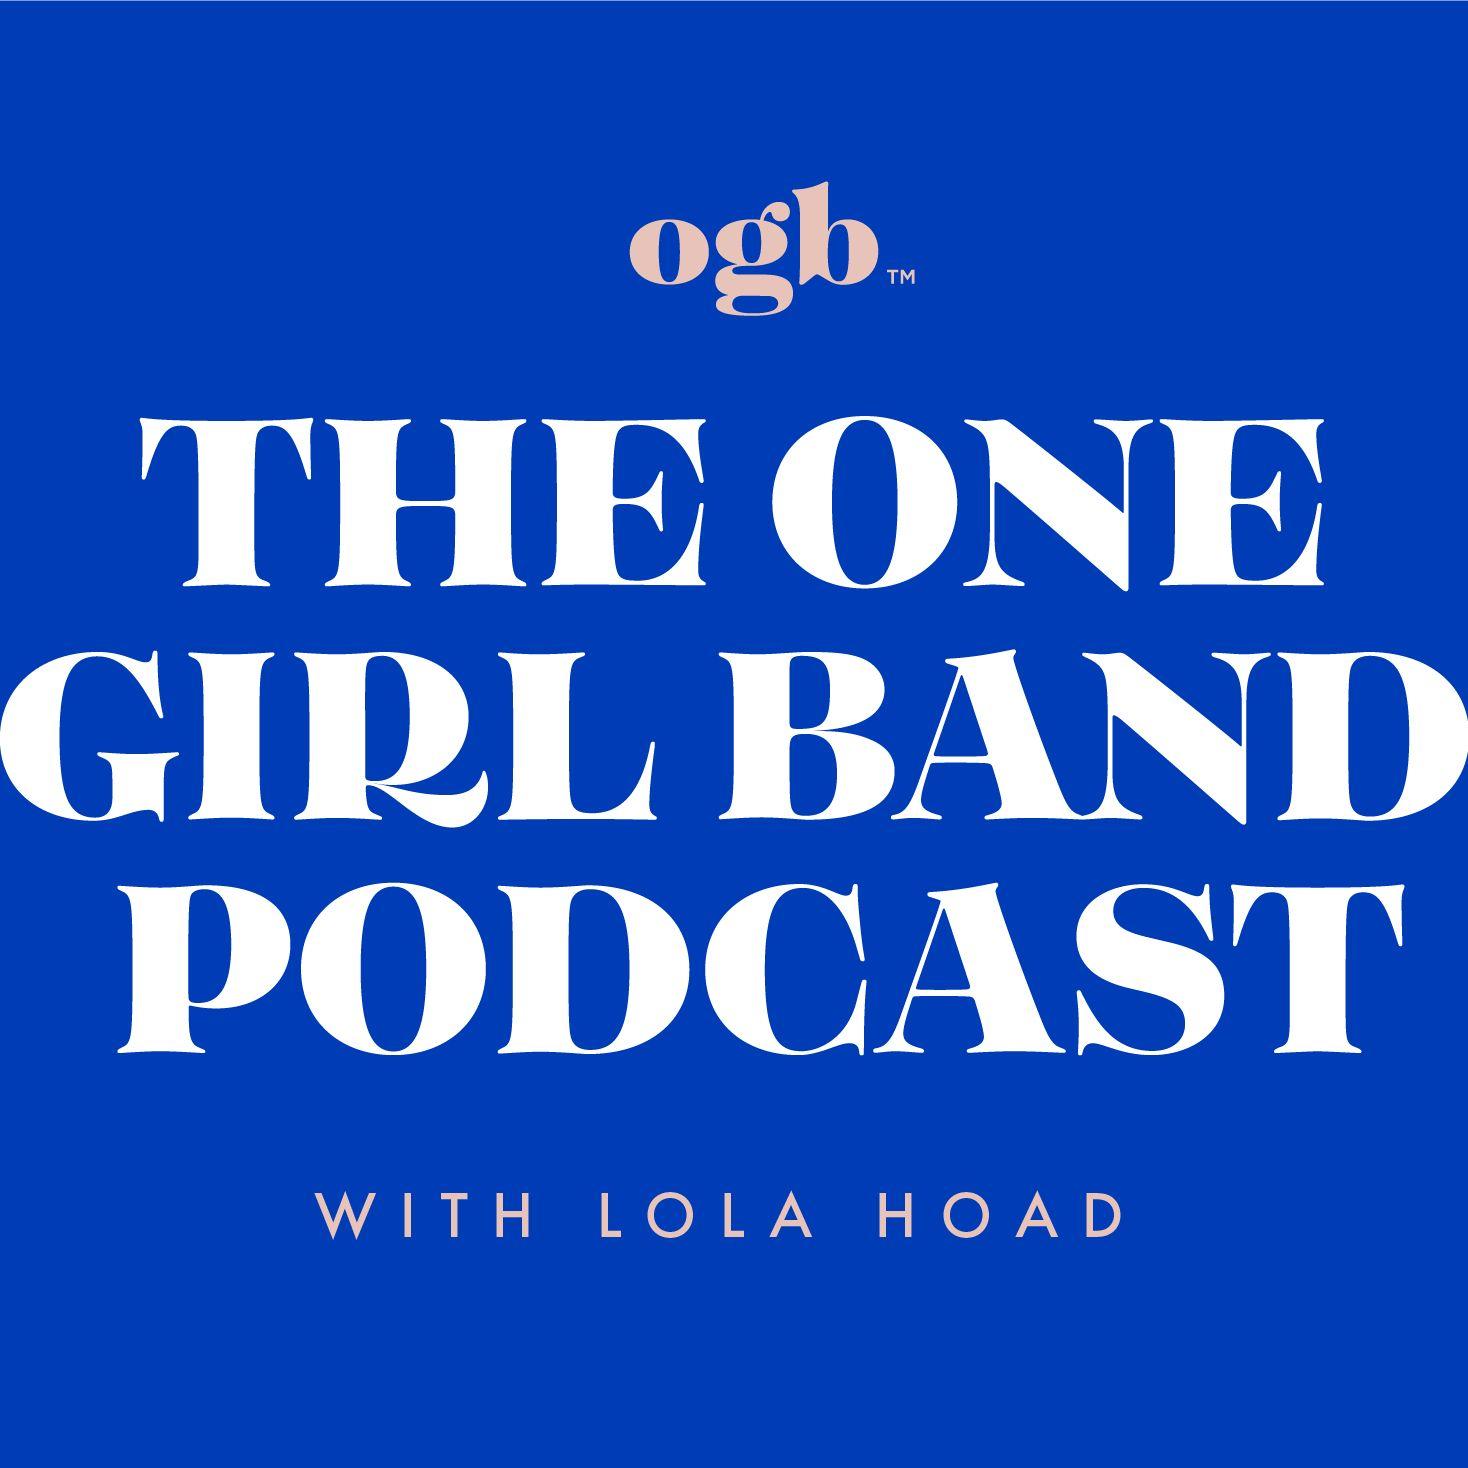 one girl band podcast.jpg